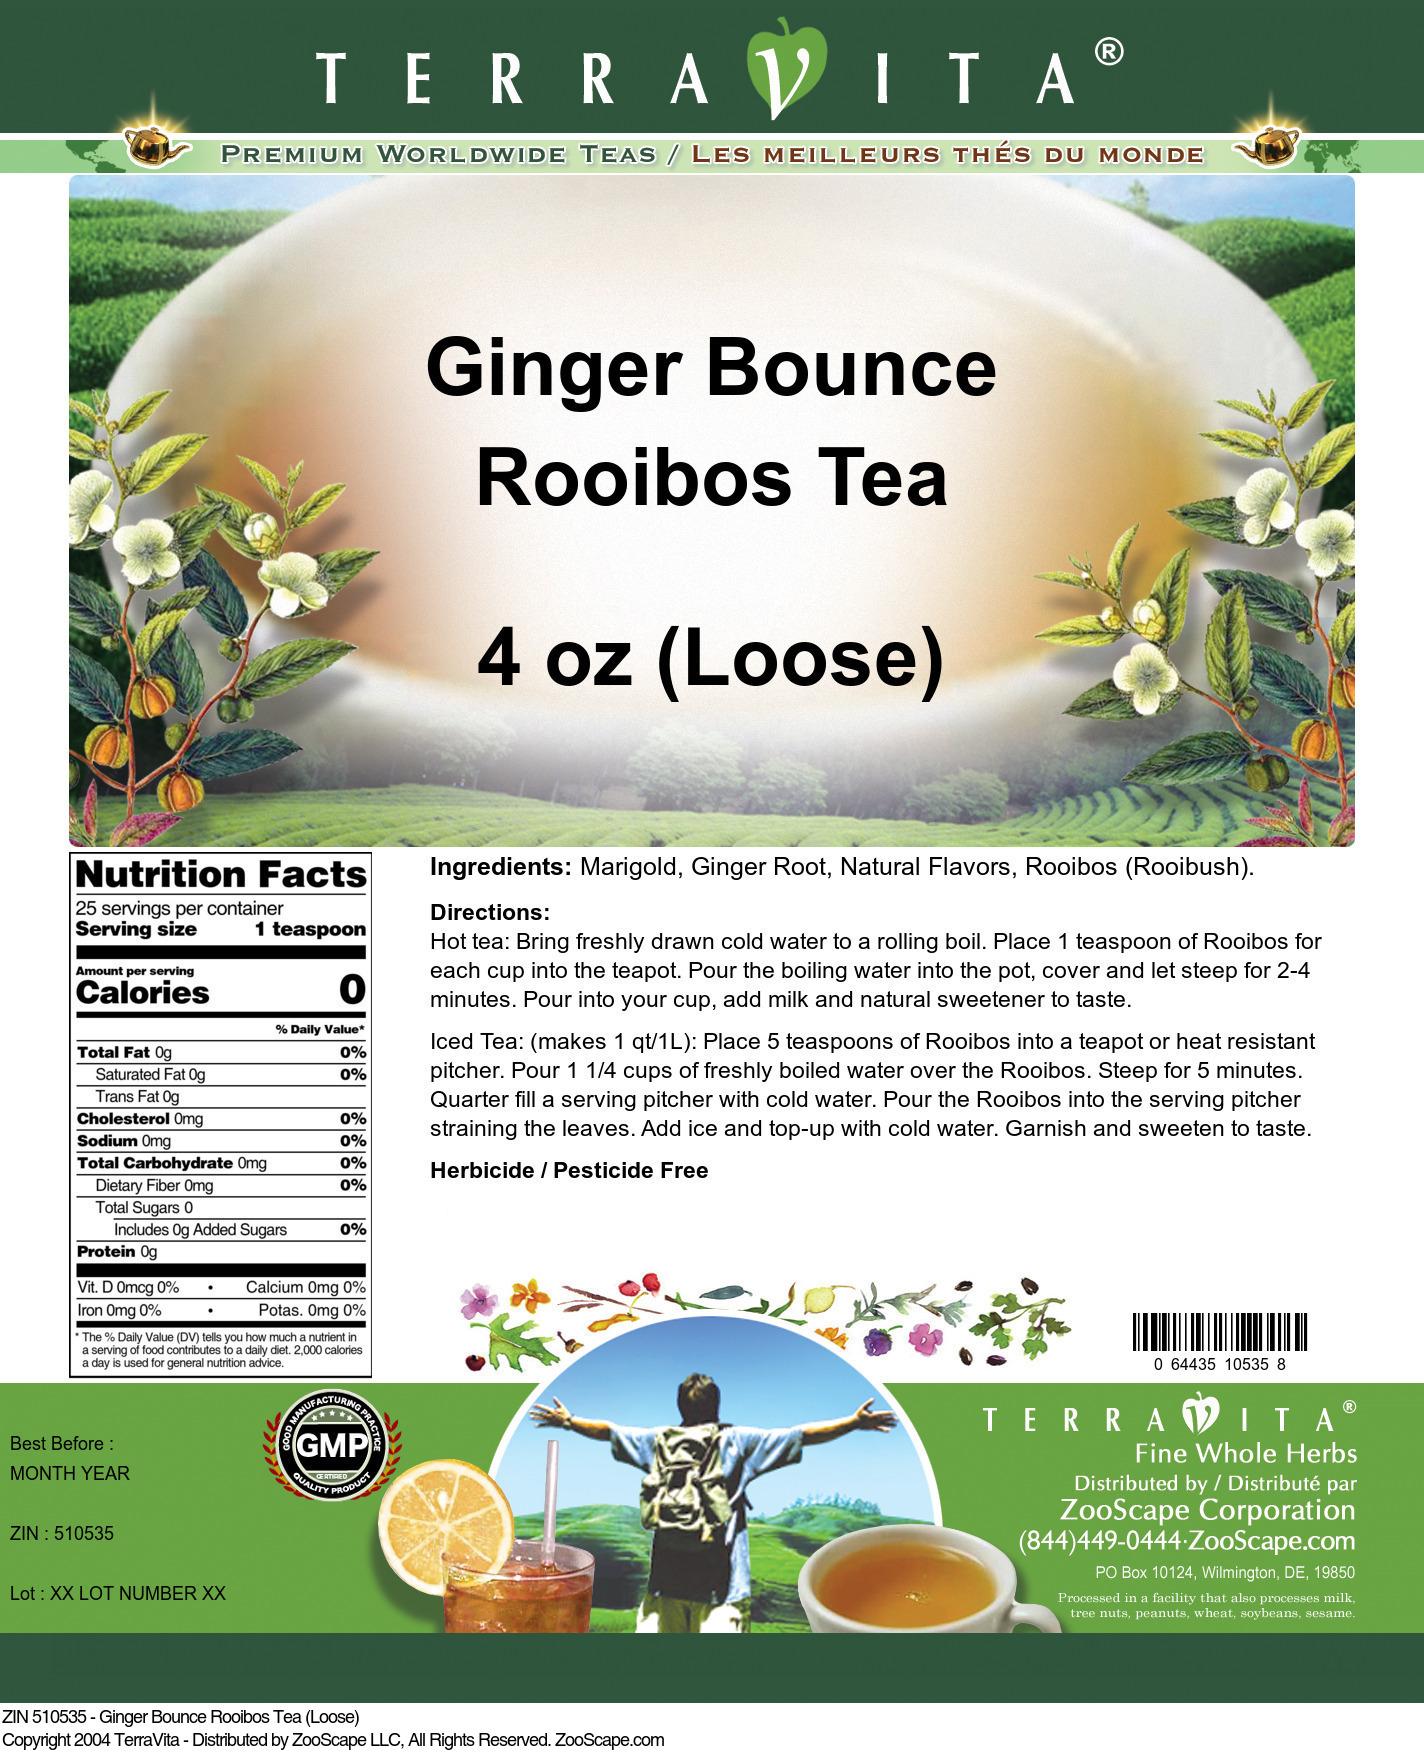 Ginger Bounce Rooibos Tea (Loose)